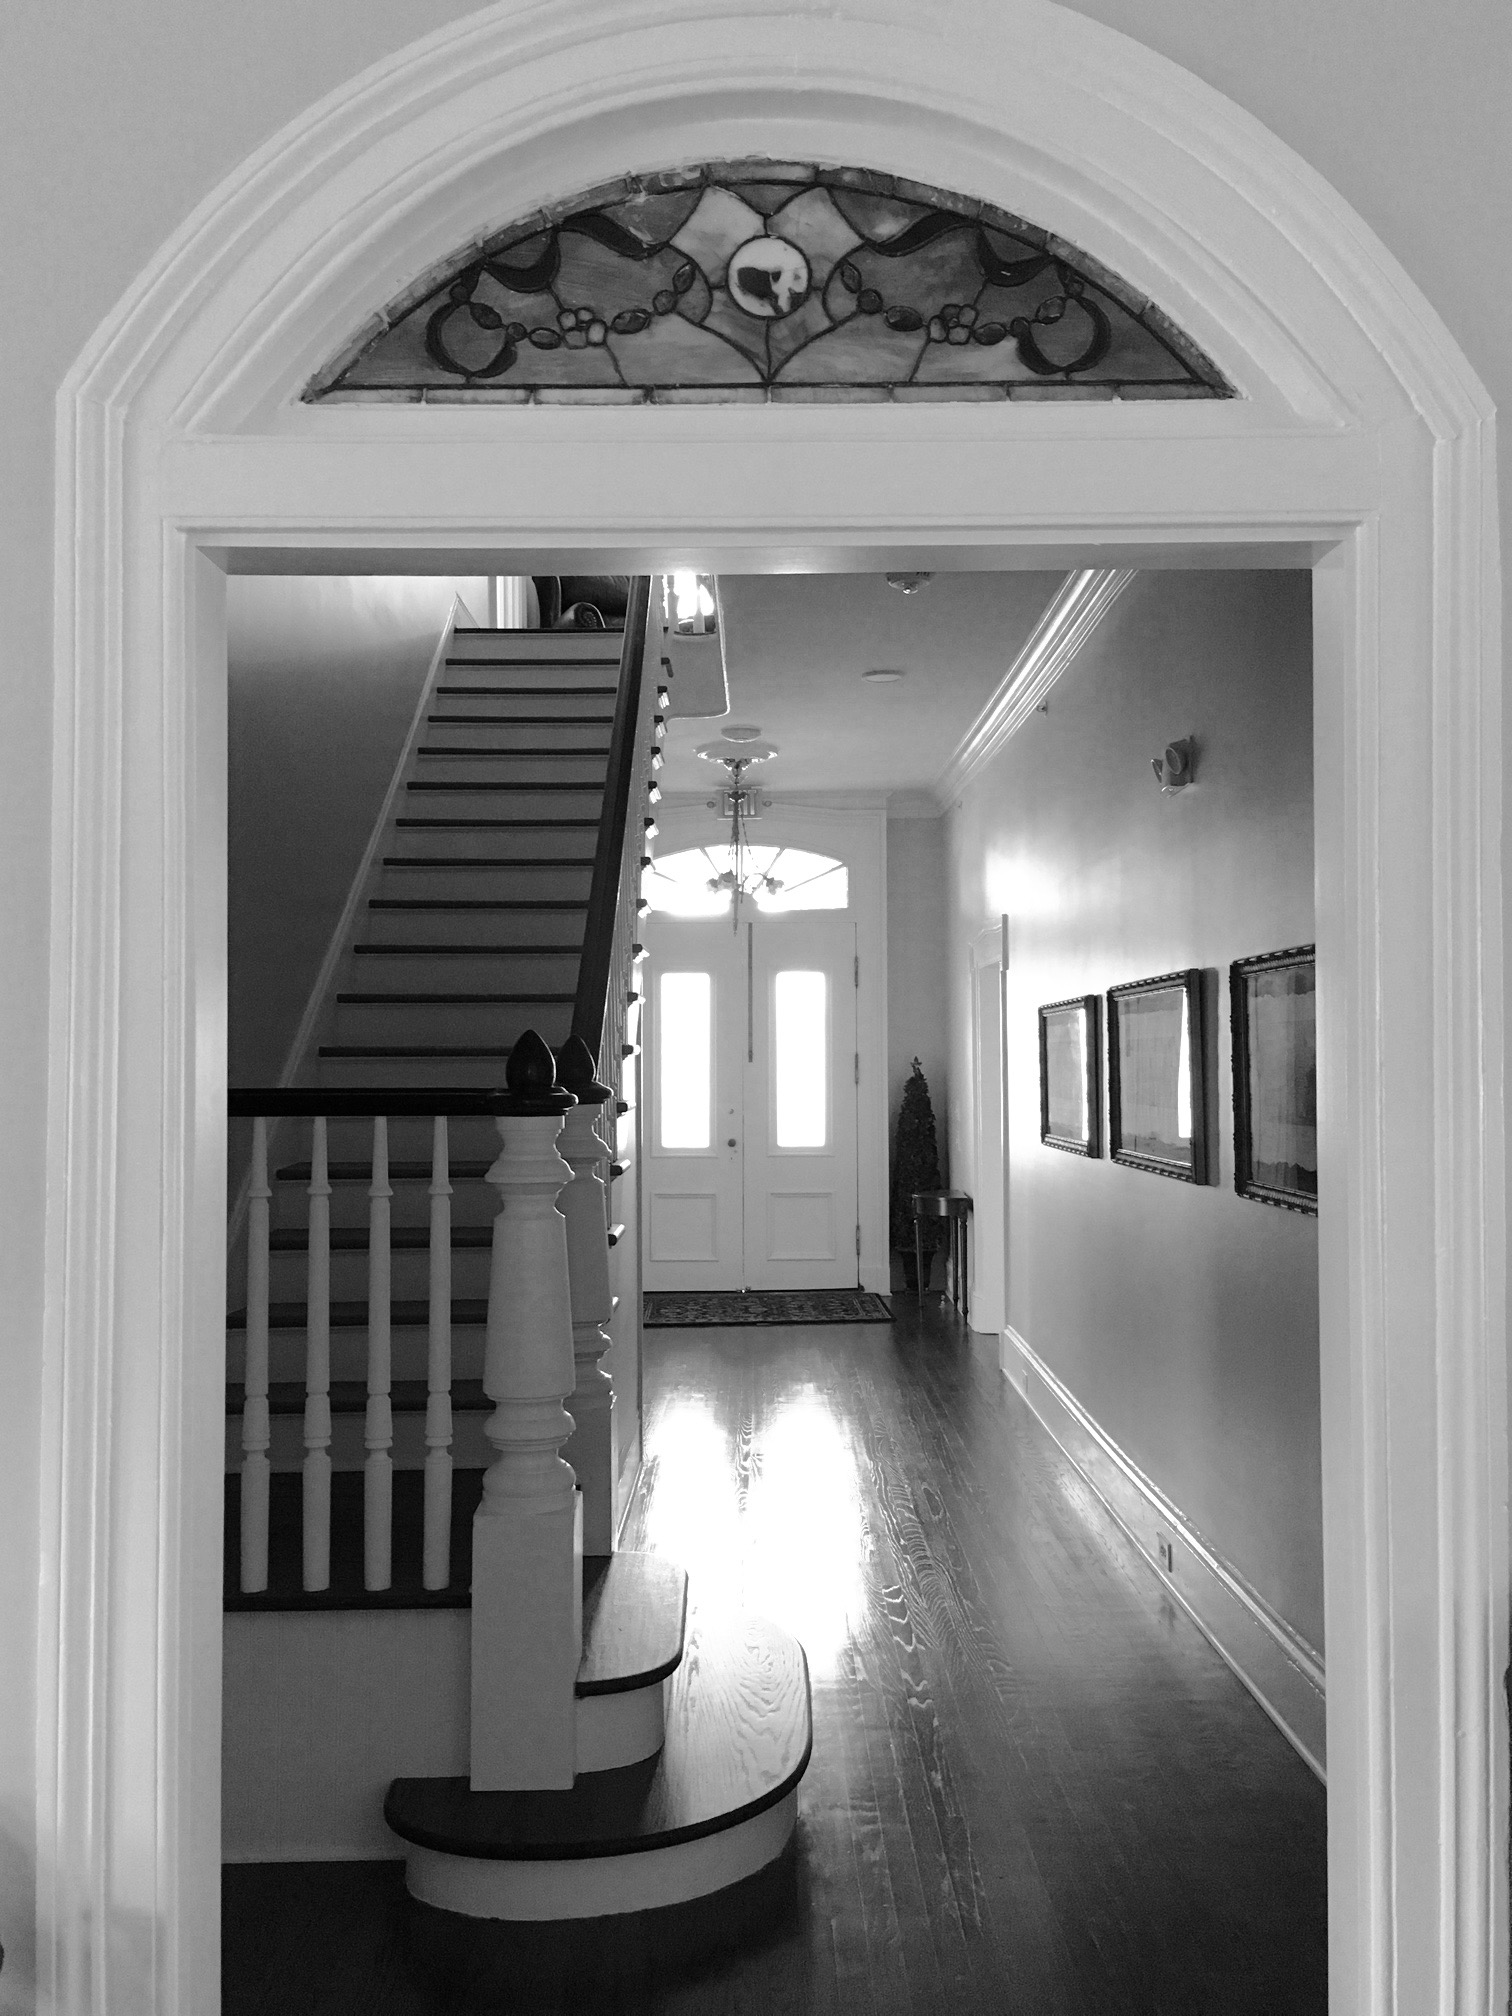 Interior Central Hall B&W.jpg